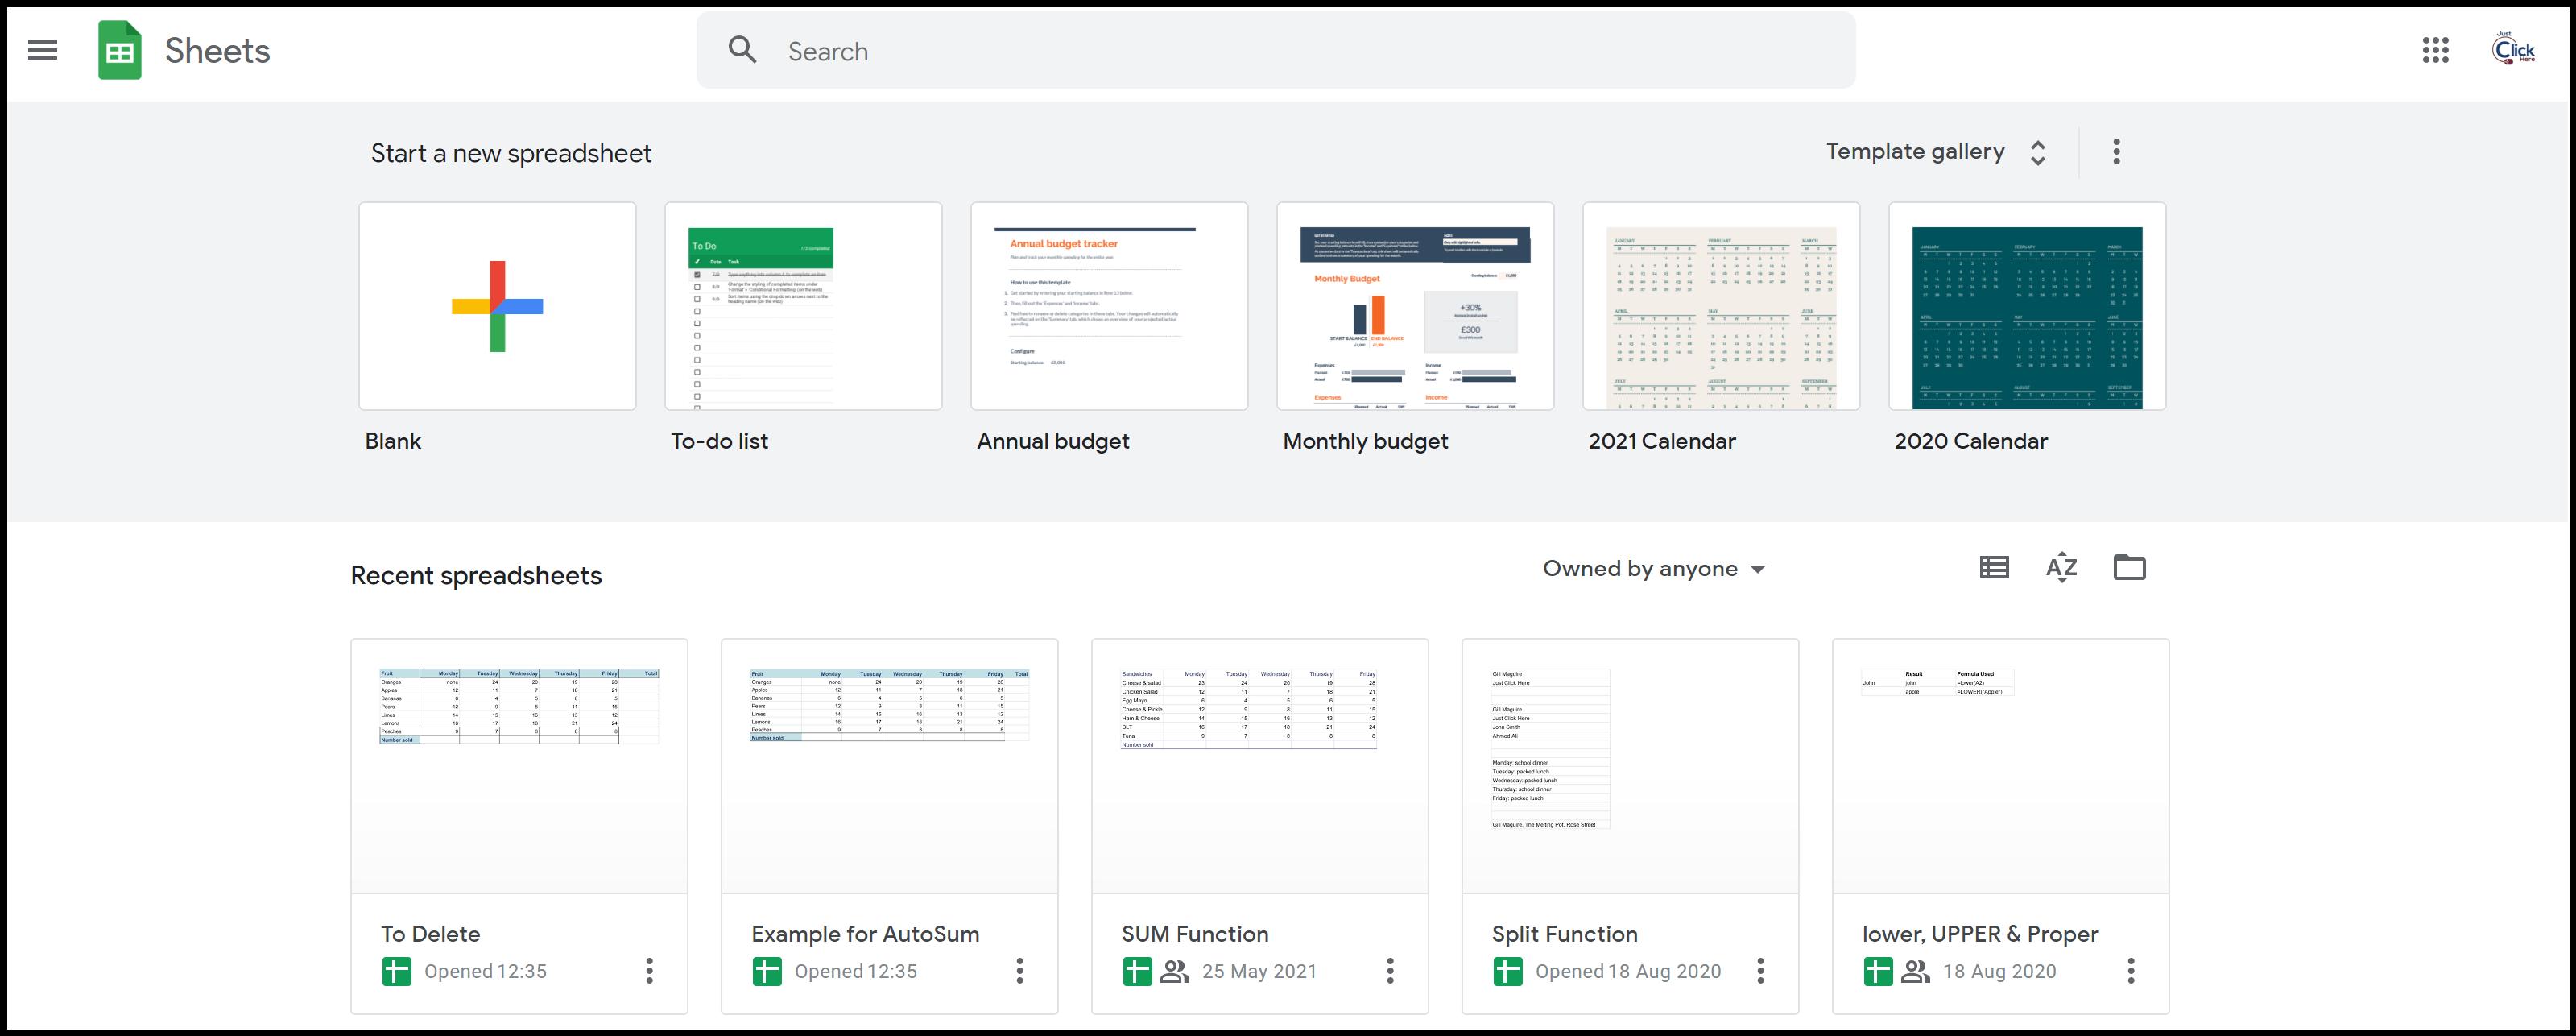 Sheets Homepage